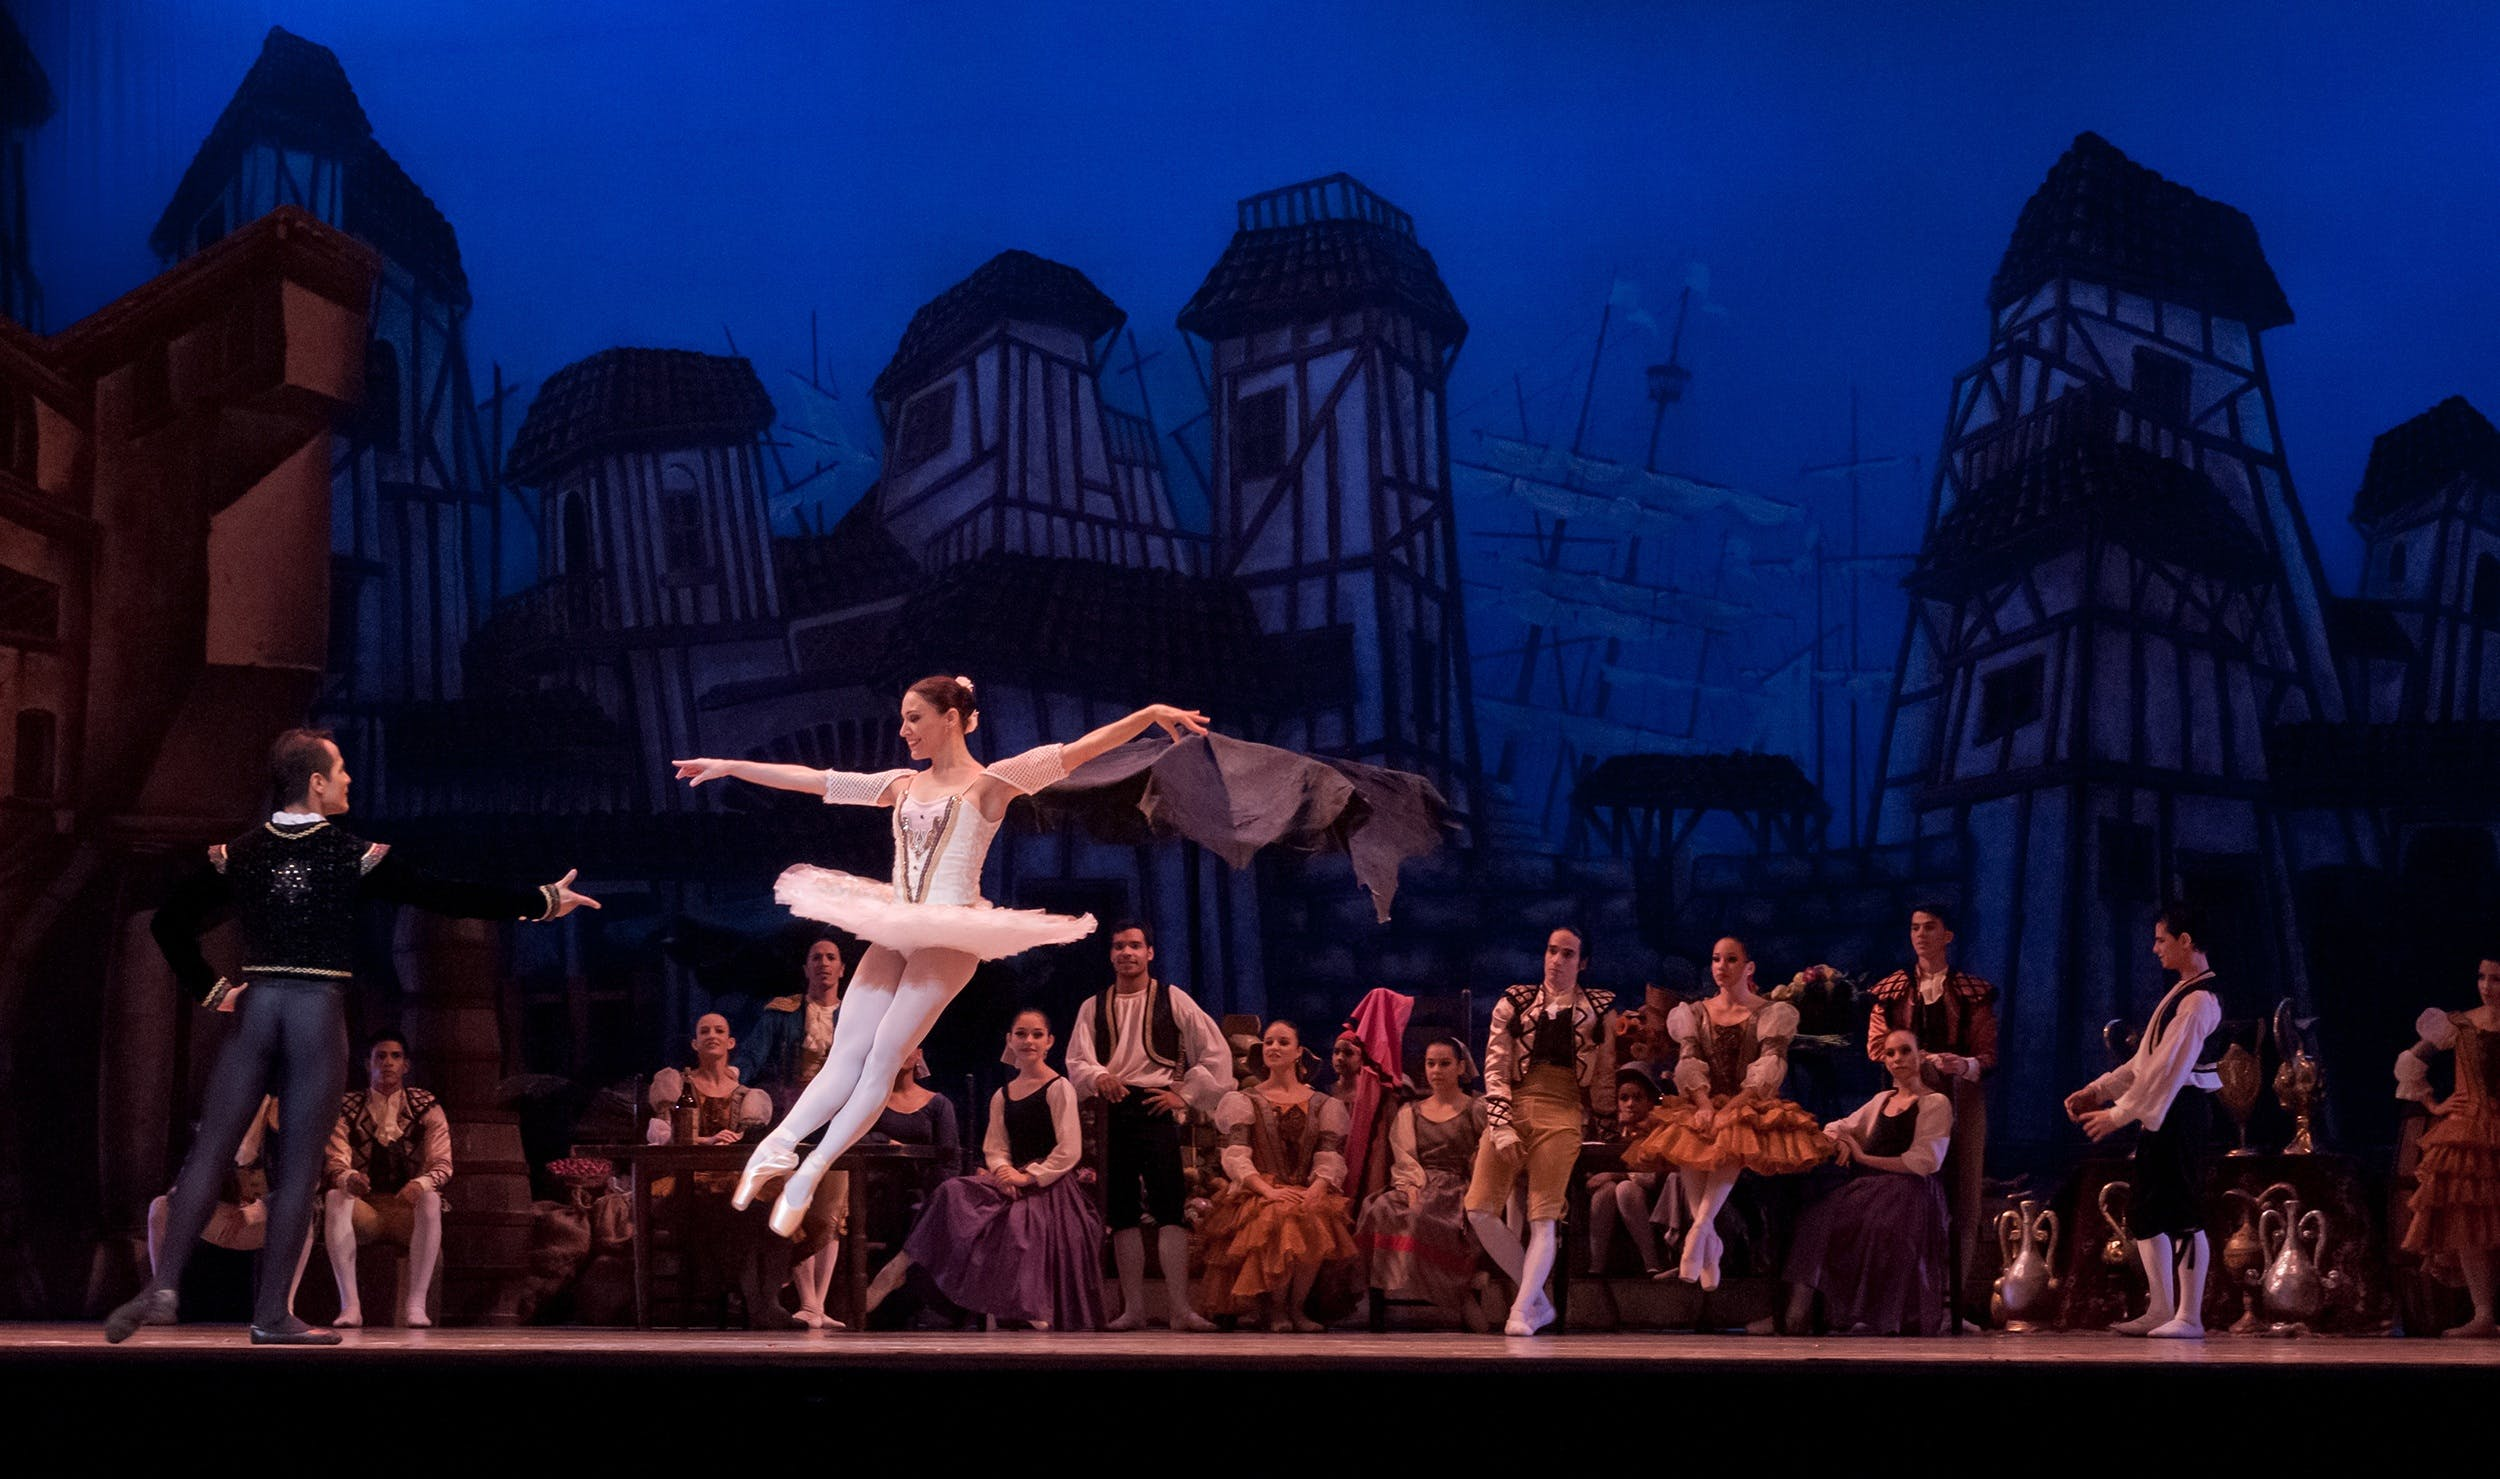 Fotos de stock gratuitas de actores, actuación, artistas, bailar